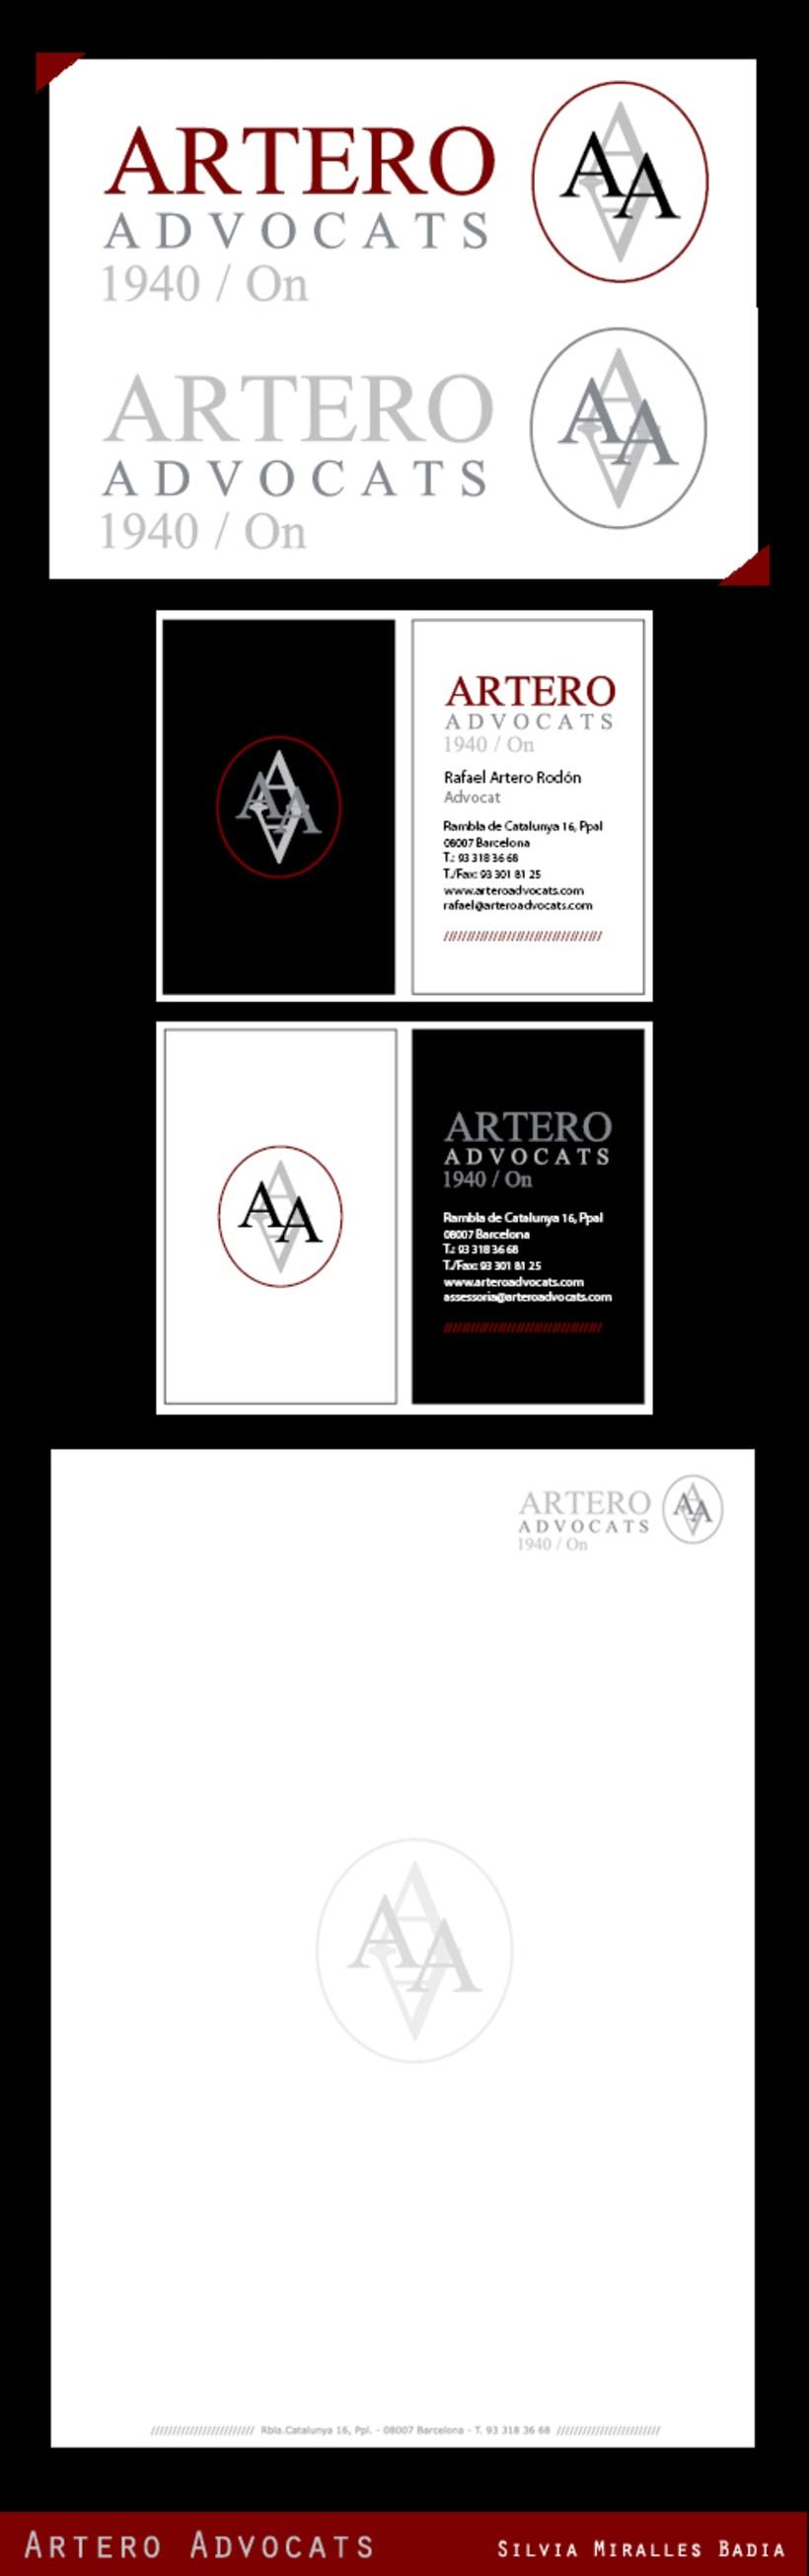 Artero Advocats /// #logo #branding 1